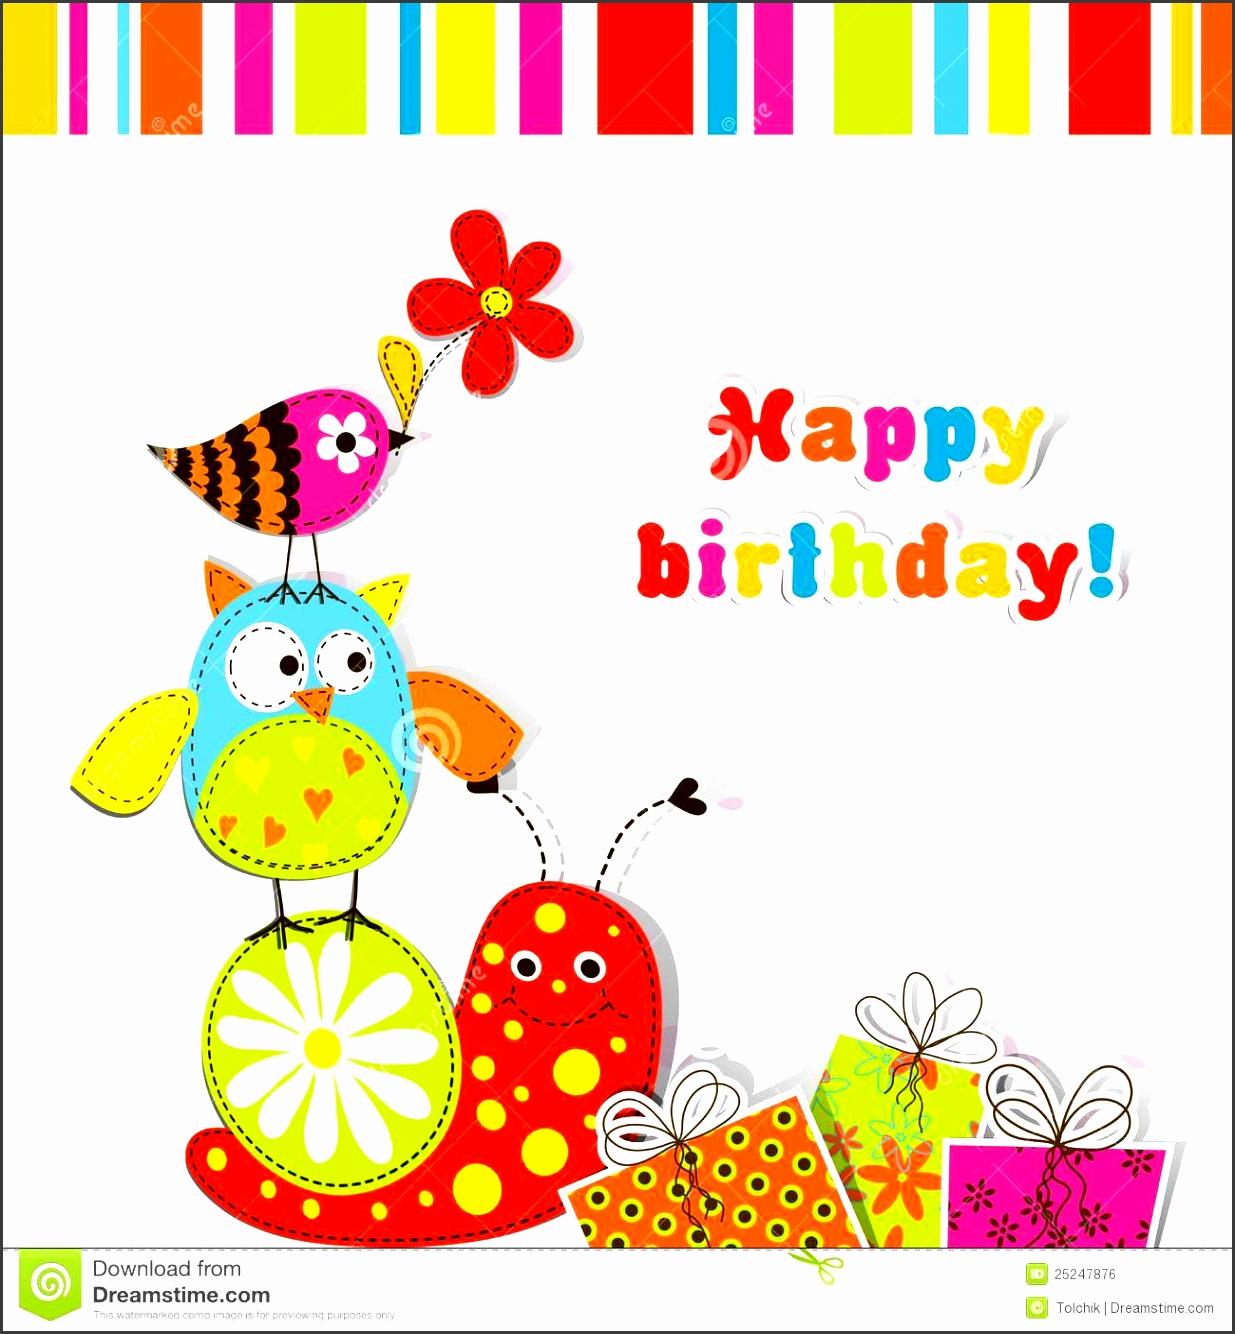 free birthday card template invitations nice greeting cute simple design